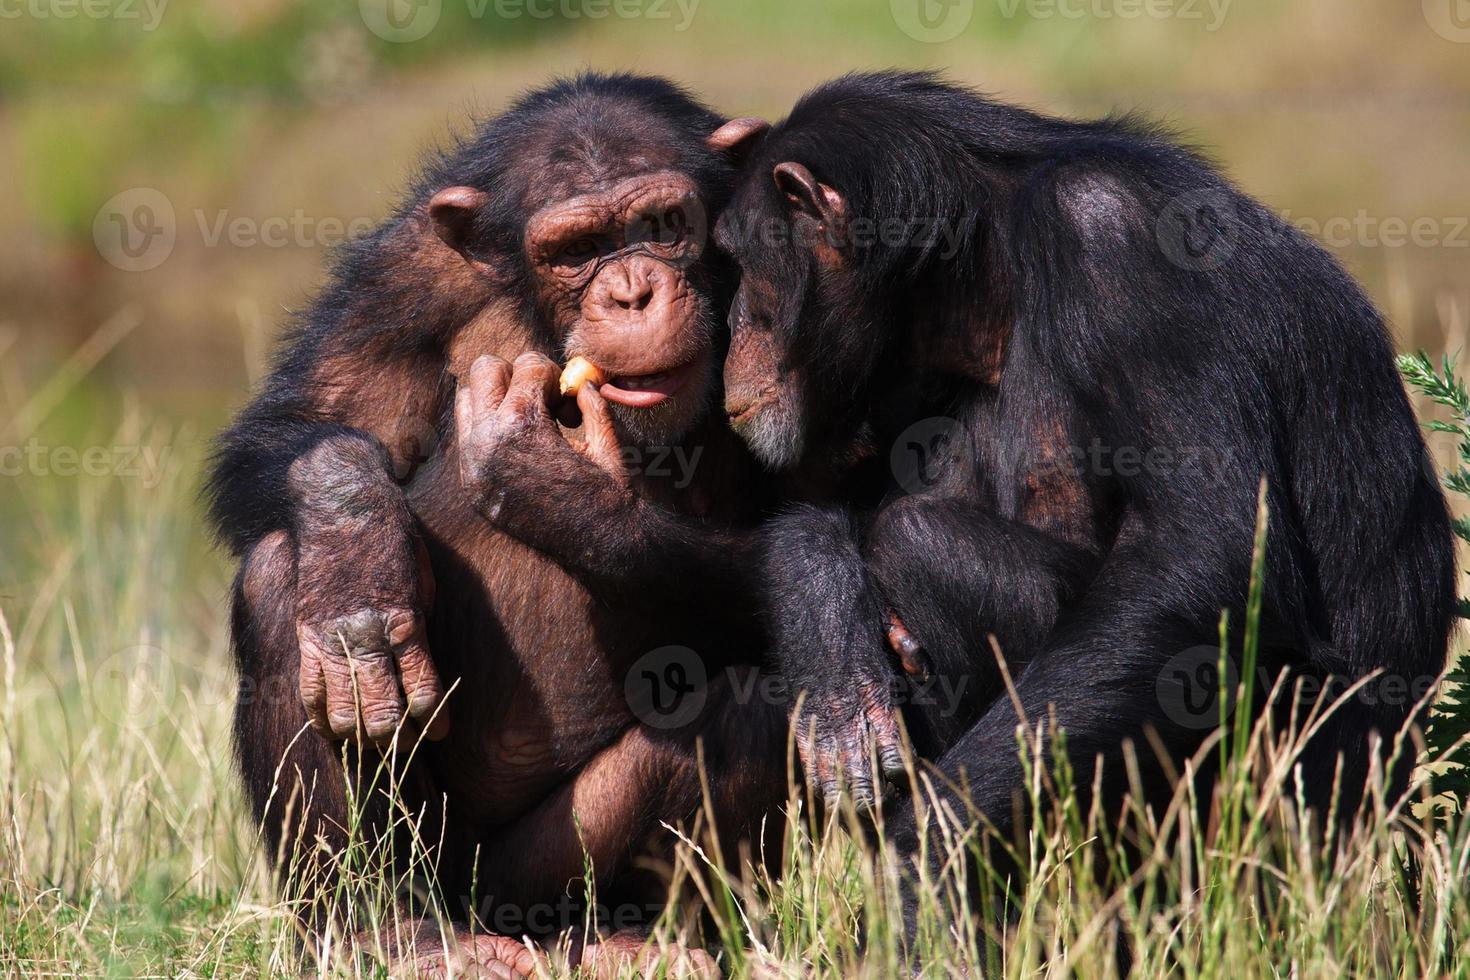 chimpanzees eating a carrot photo